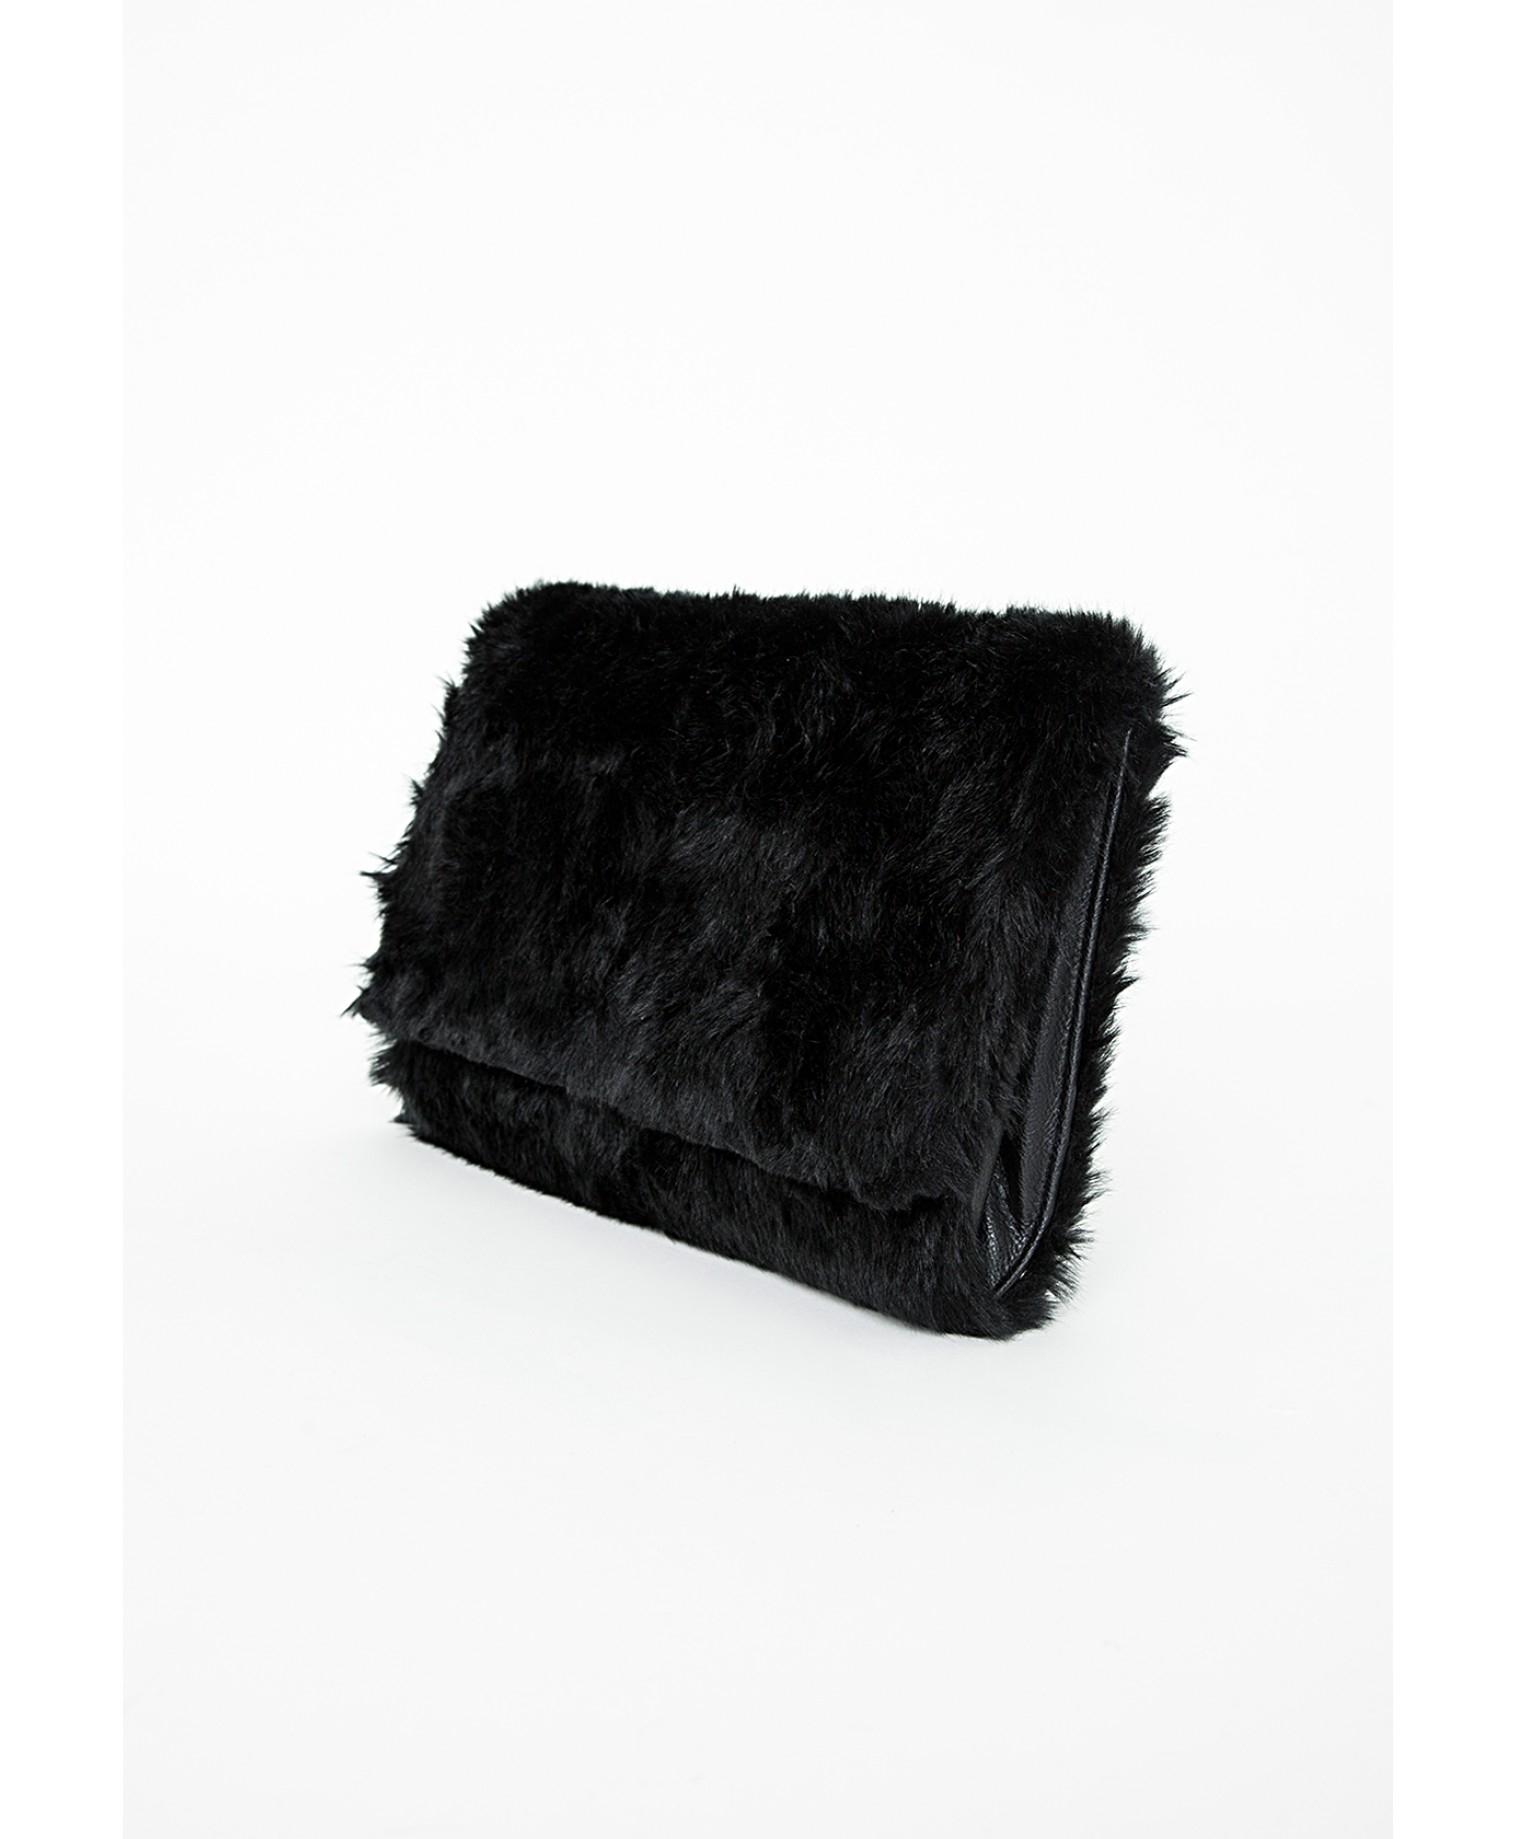 15e37b63af Lyst - Missguided Faux Fur Clutch Black in Black